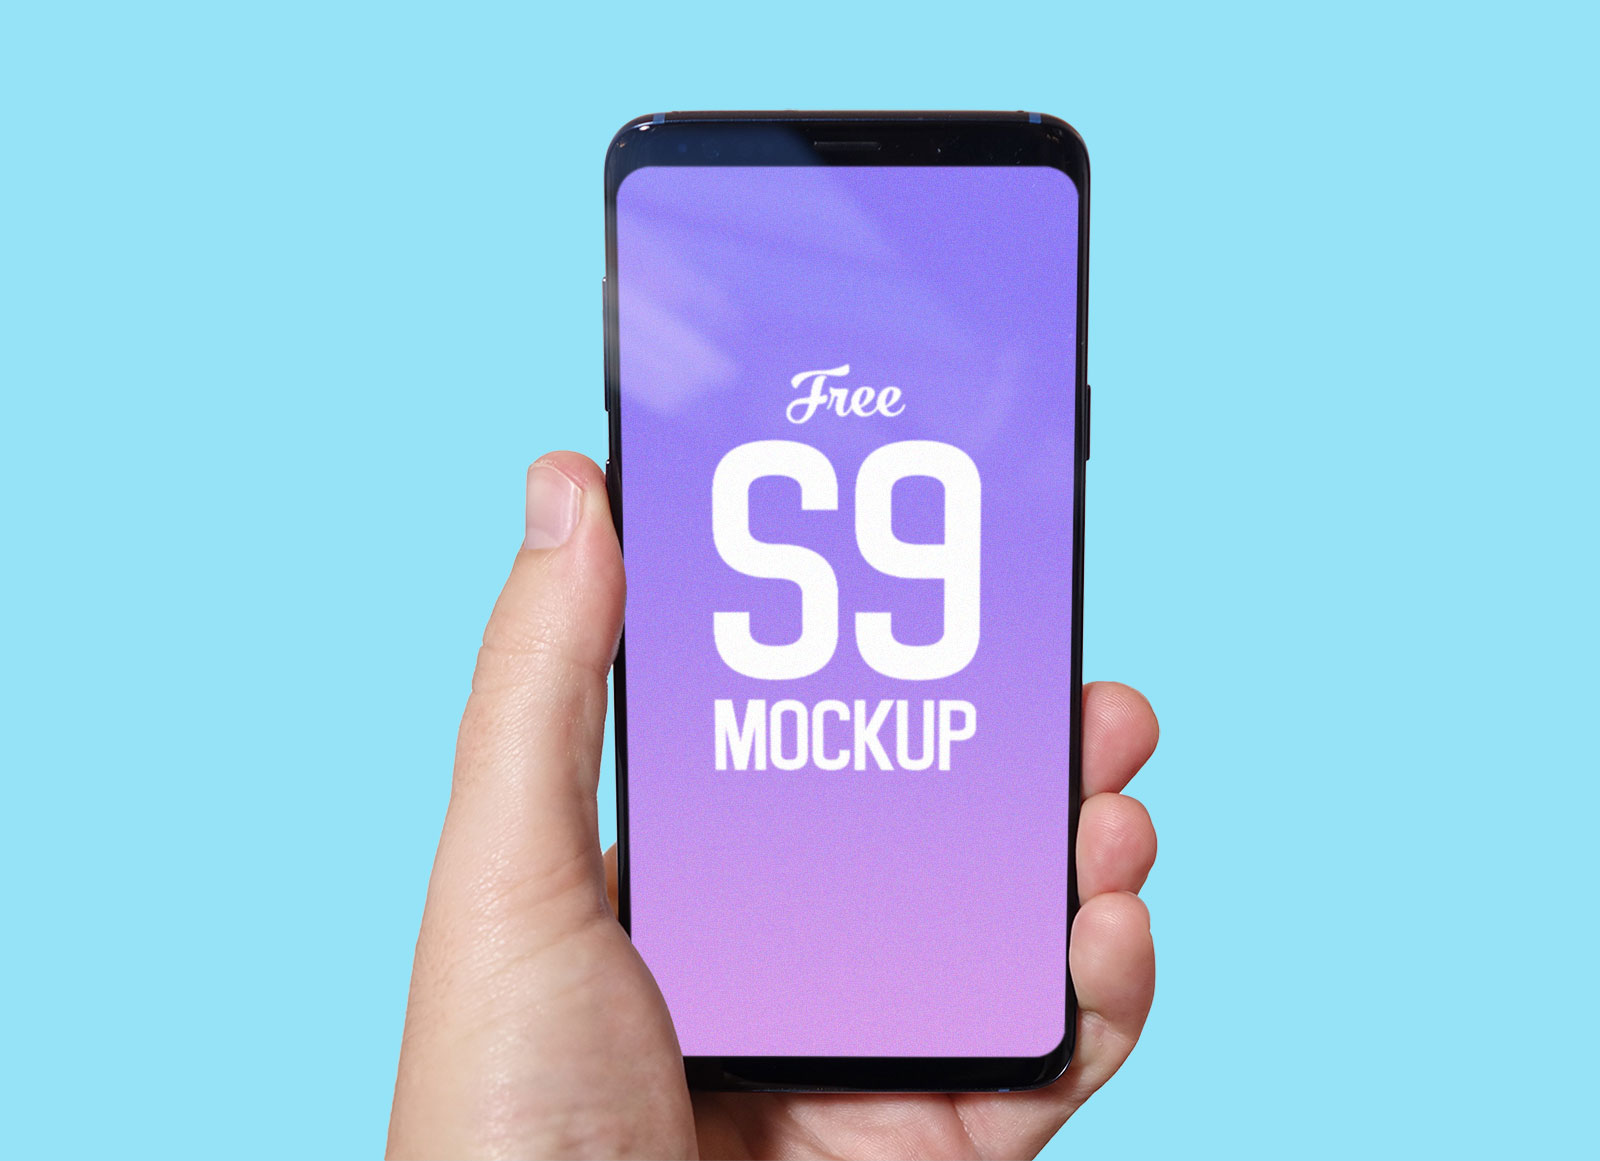 Free-Hand-Holding-Samsung-Galaxy-S9-Mockup-PSD